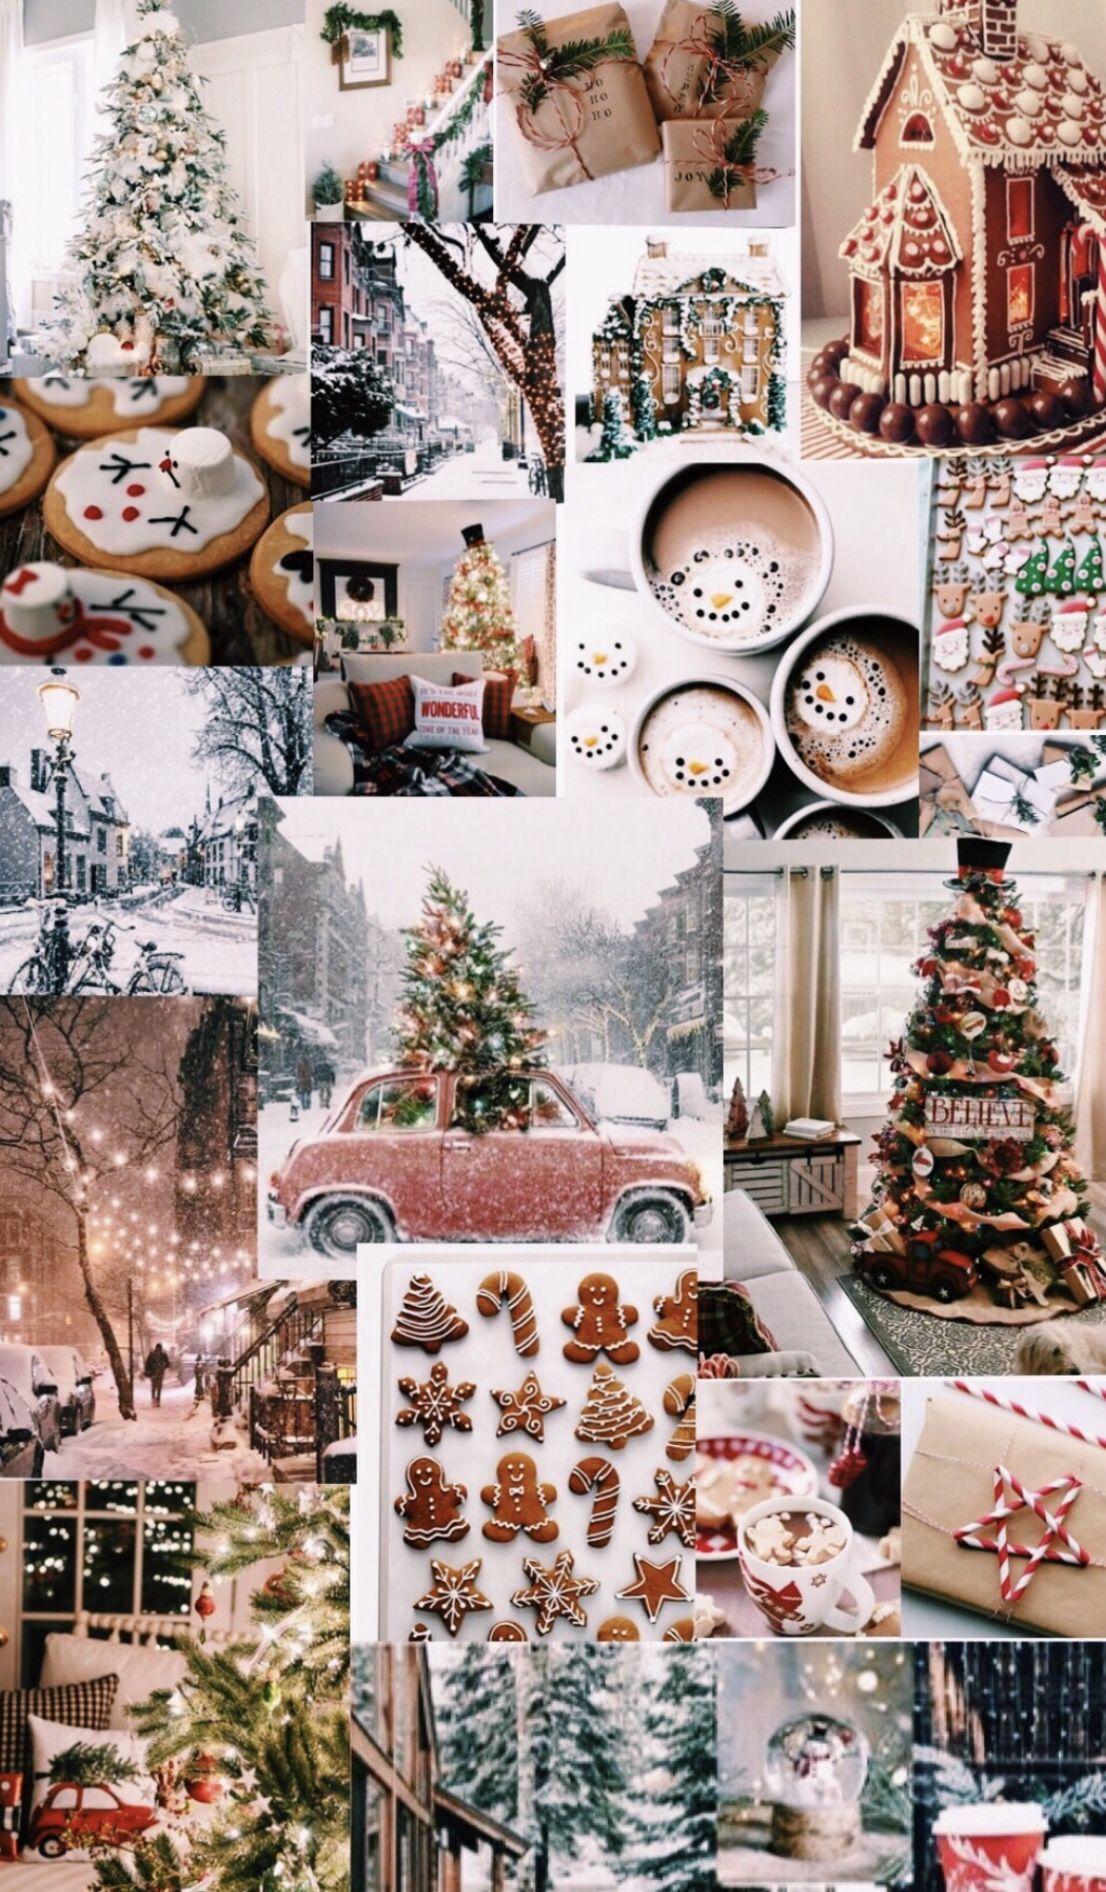 Christmas Collage Iphone Wallpaper Wallpaper Iphone Christmas Cute Christmas Wallpaper Christmas Phone Wallpaper